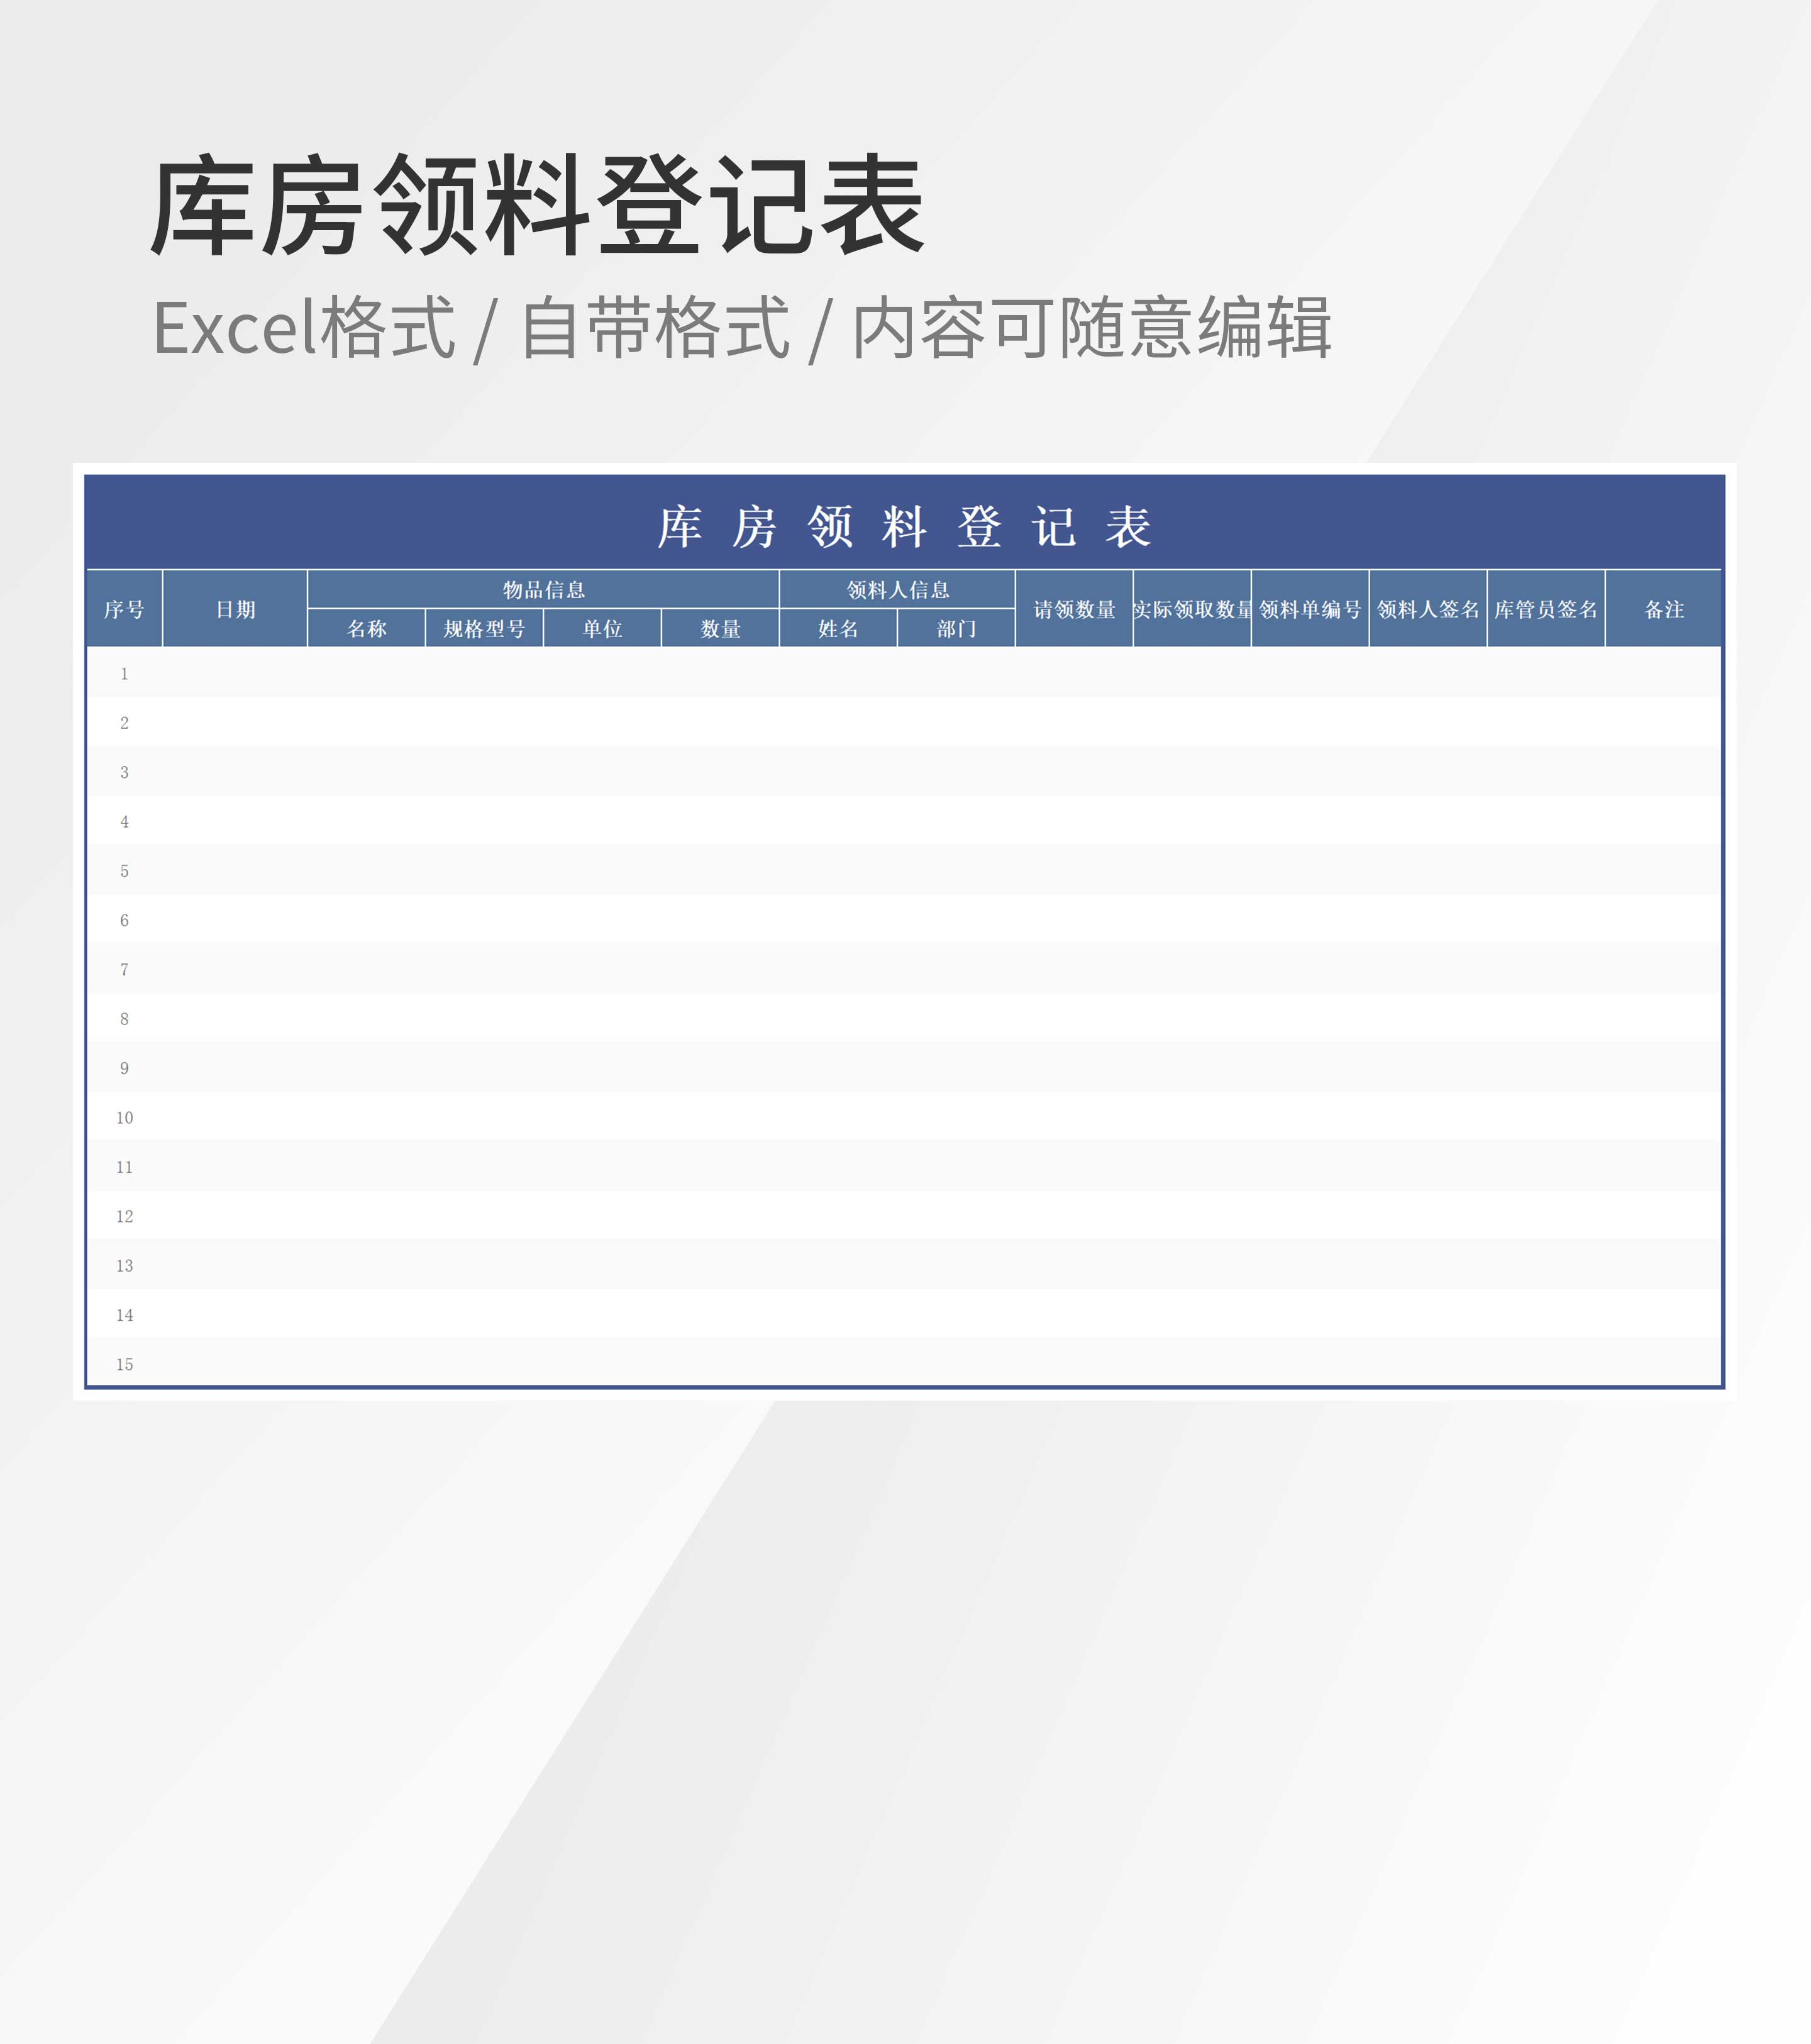 蓝色库房领料登记表Excel模板